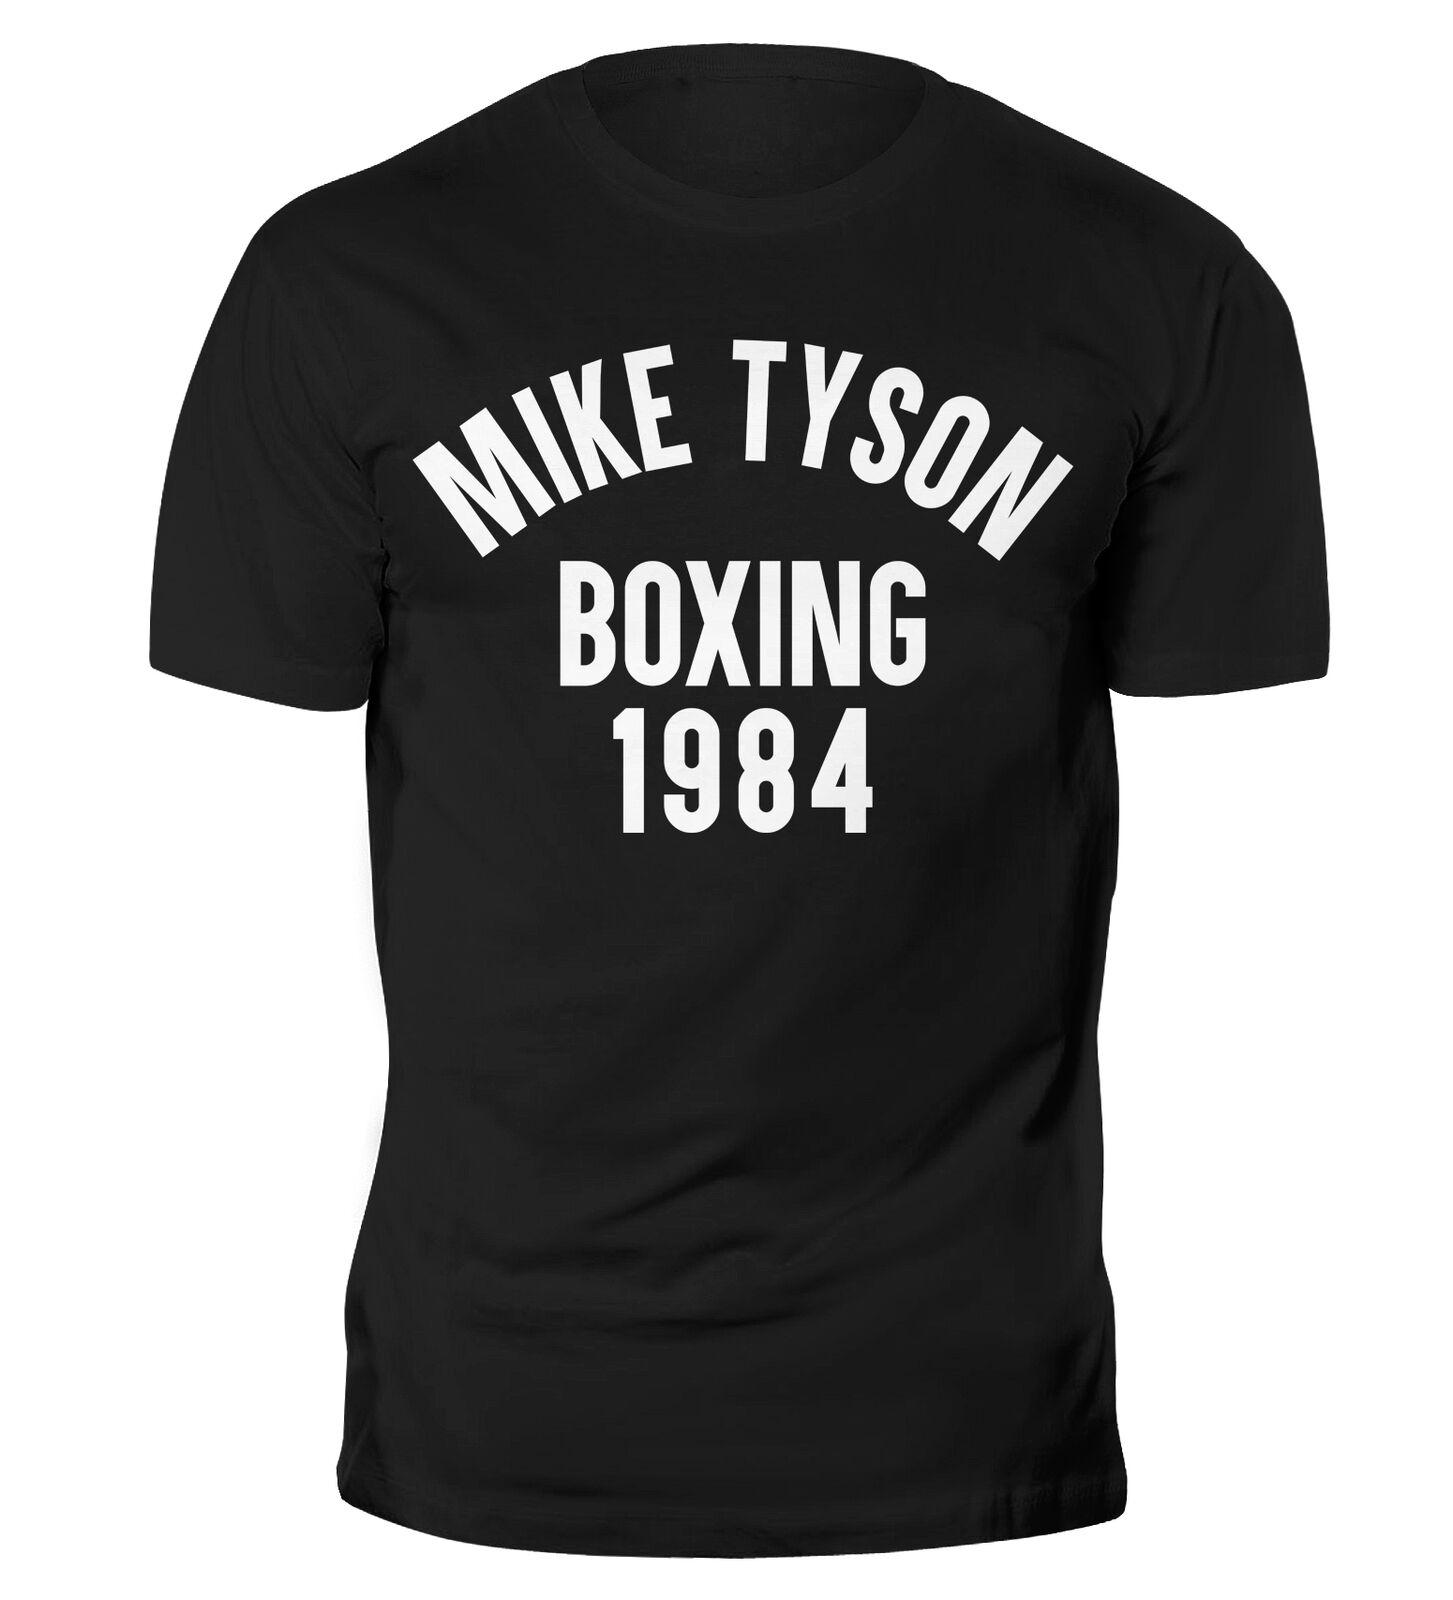 Camiseta de entrenamiento de gimnasia Mike Tyson Boxing 1984, camiseta de manga corta de algodón con cuello redondo para hombre, nueva S-3XL